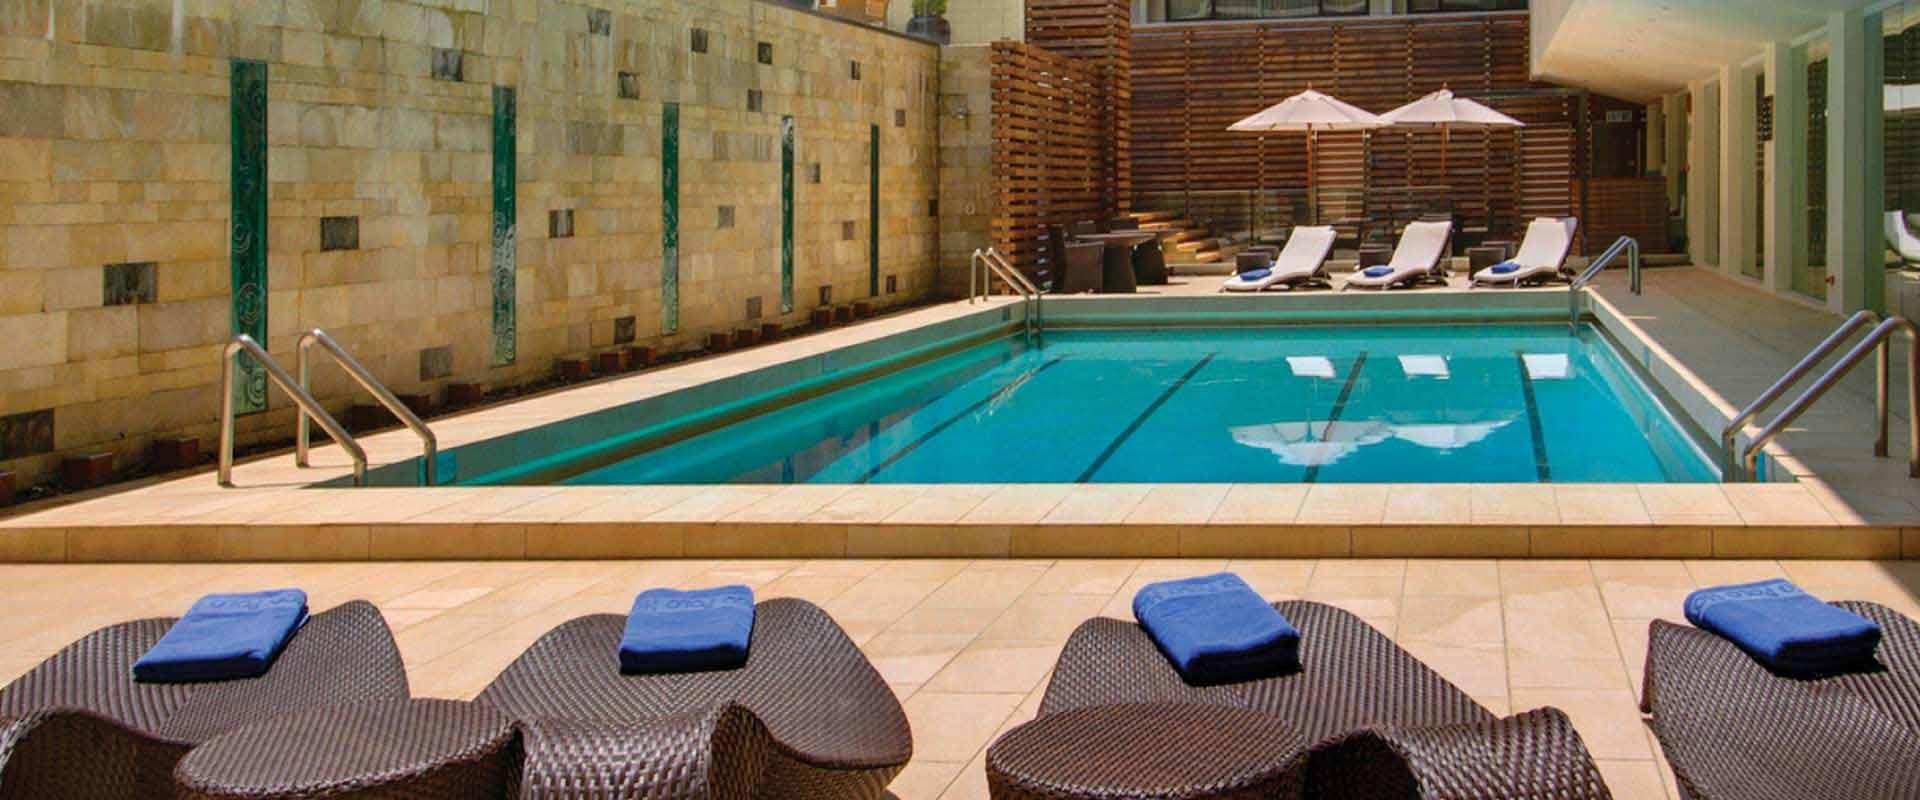 Hotel Review Marco Polo Hongkong Travel Weekly